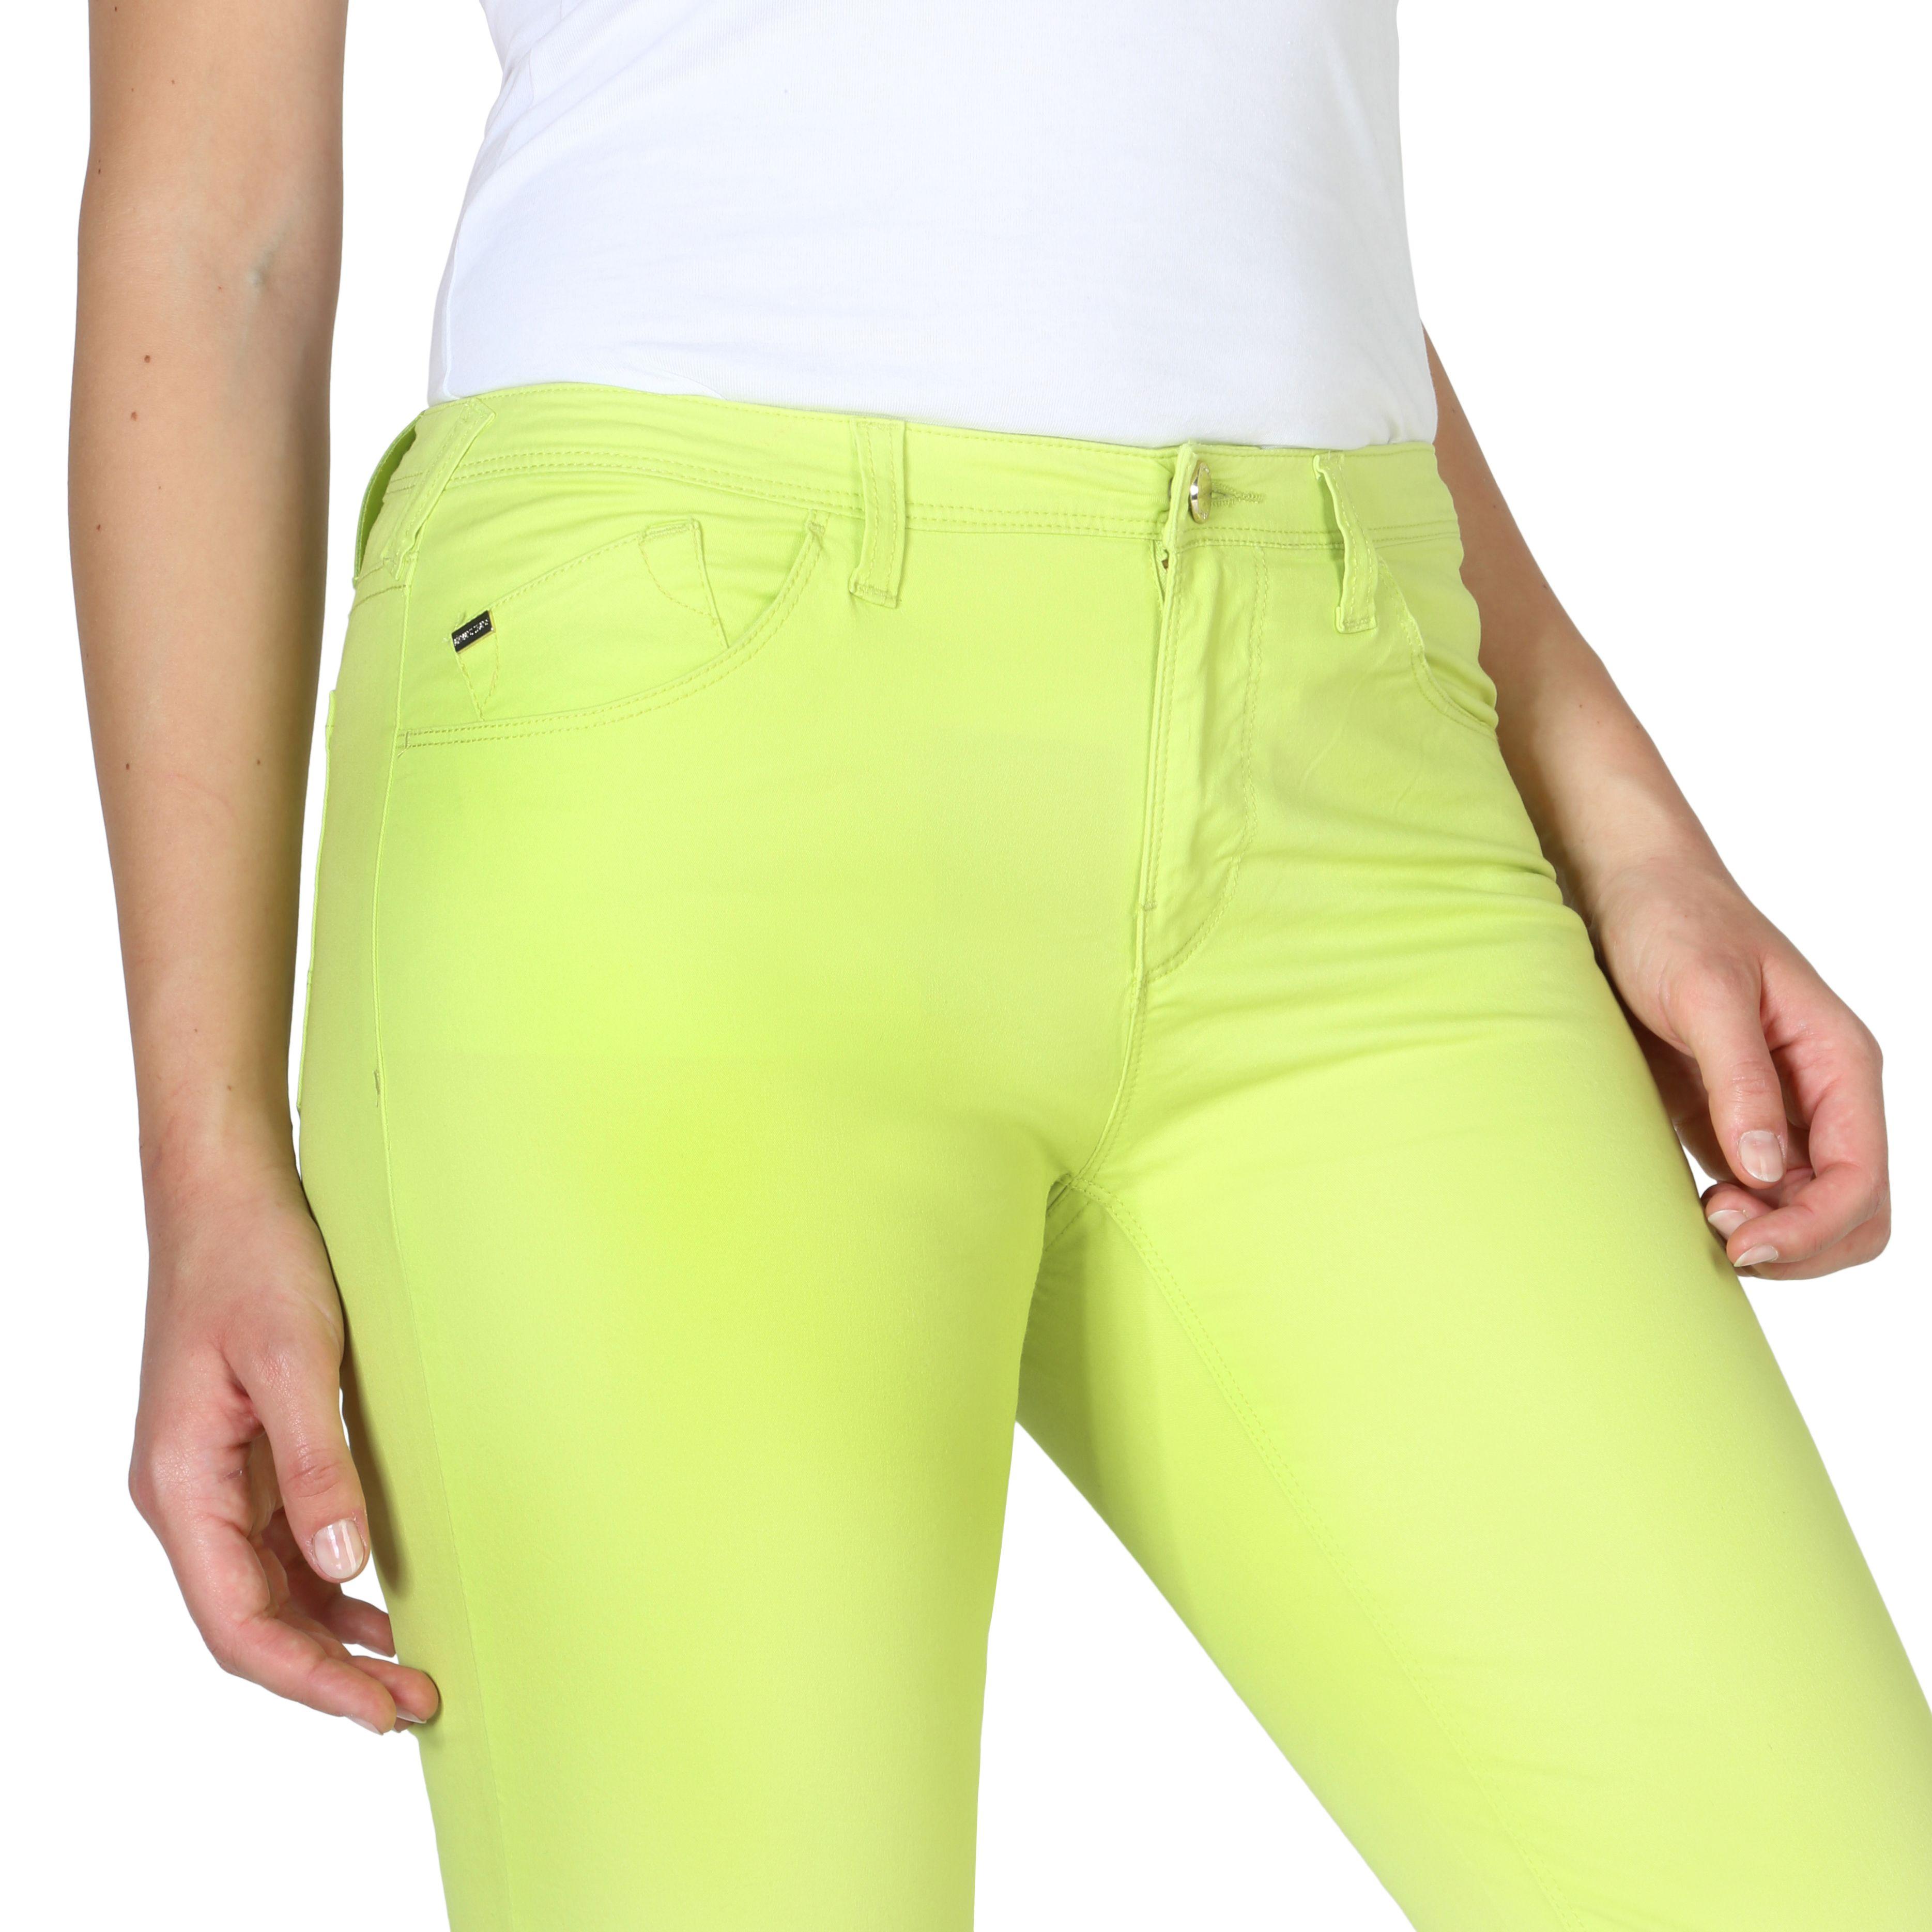 9C7296B0 A702 11Ea Aaa4 4Fcd1Fe36E6D Armani Jeans - 3Y5J28_5Nzxz - Green